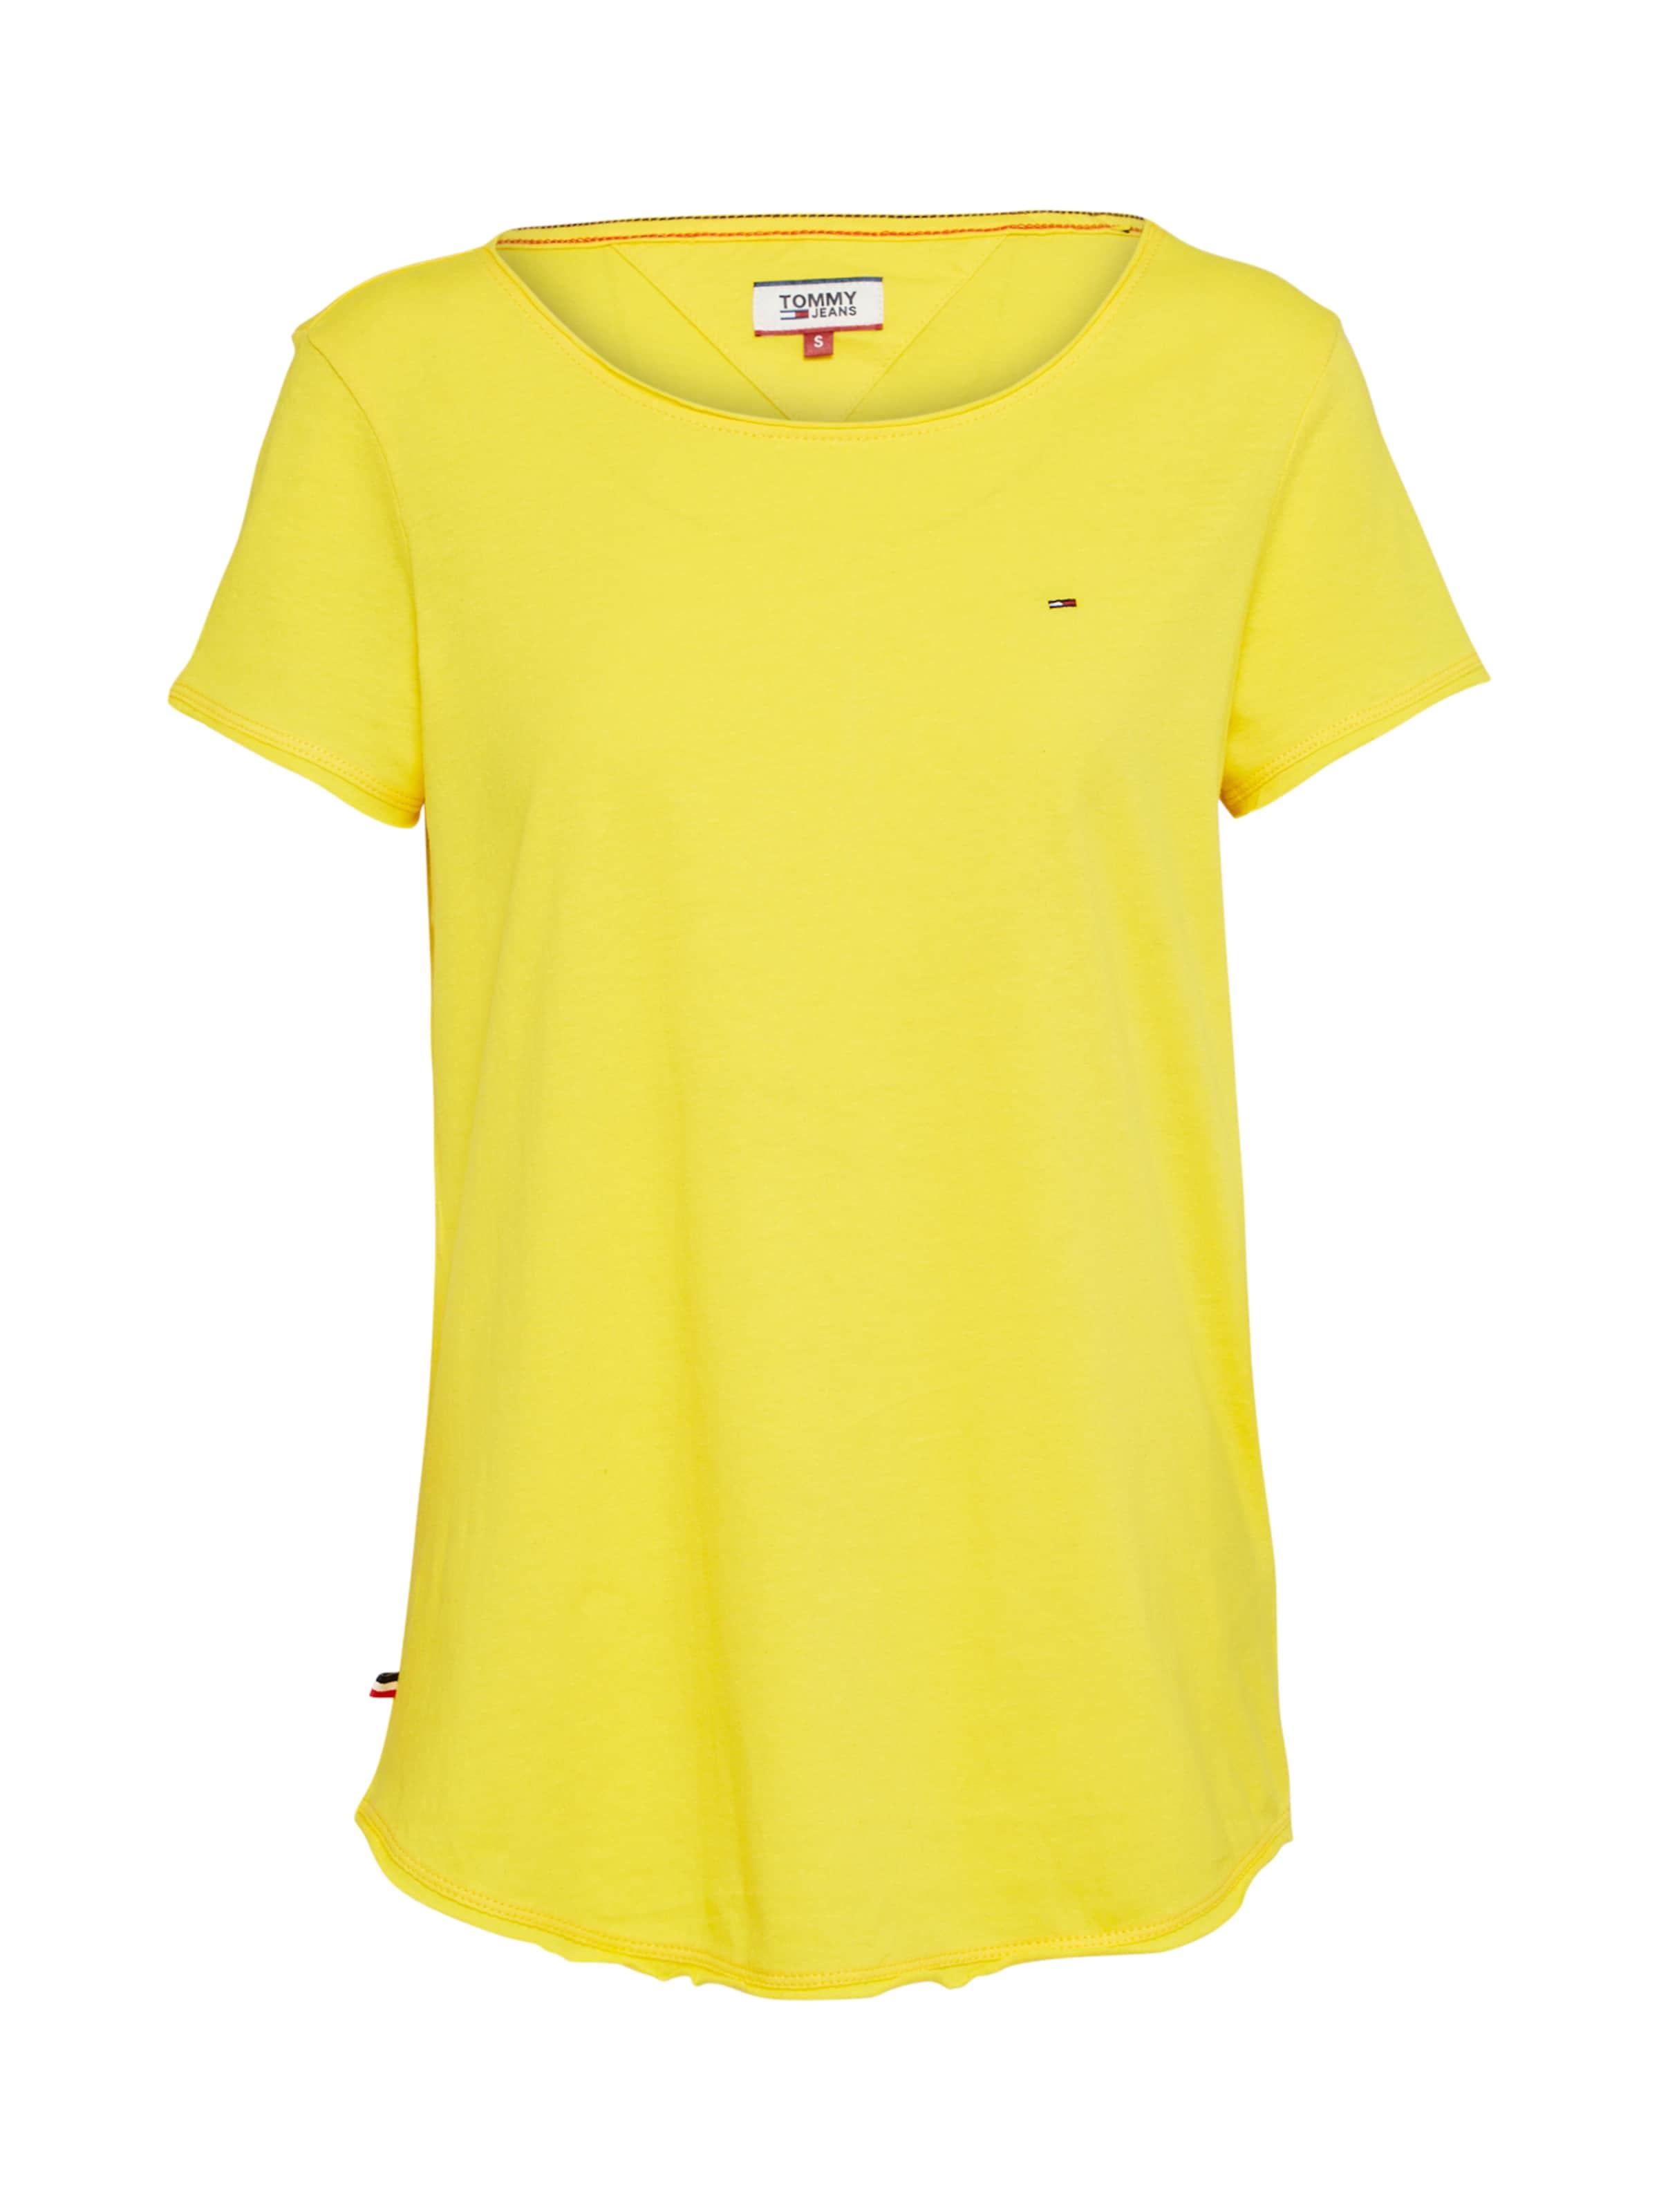 Jerseyshirt gelb Tommy Jeans 6kFRx